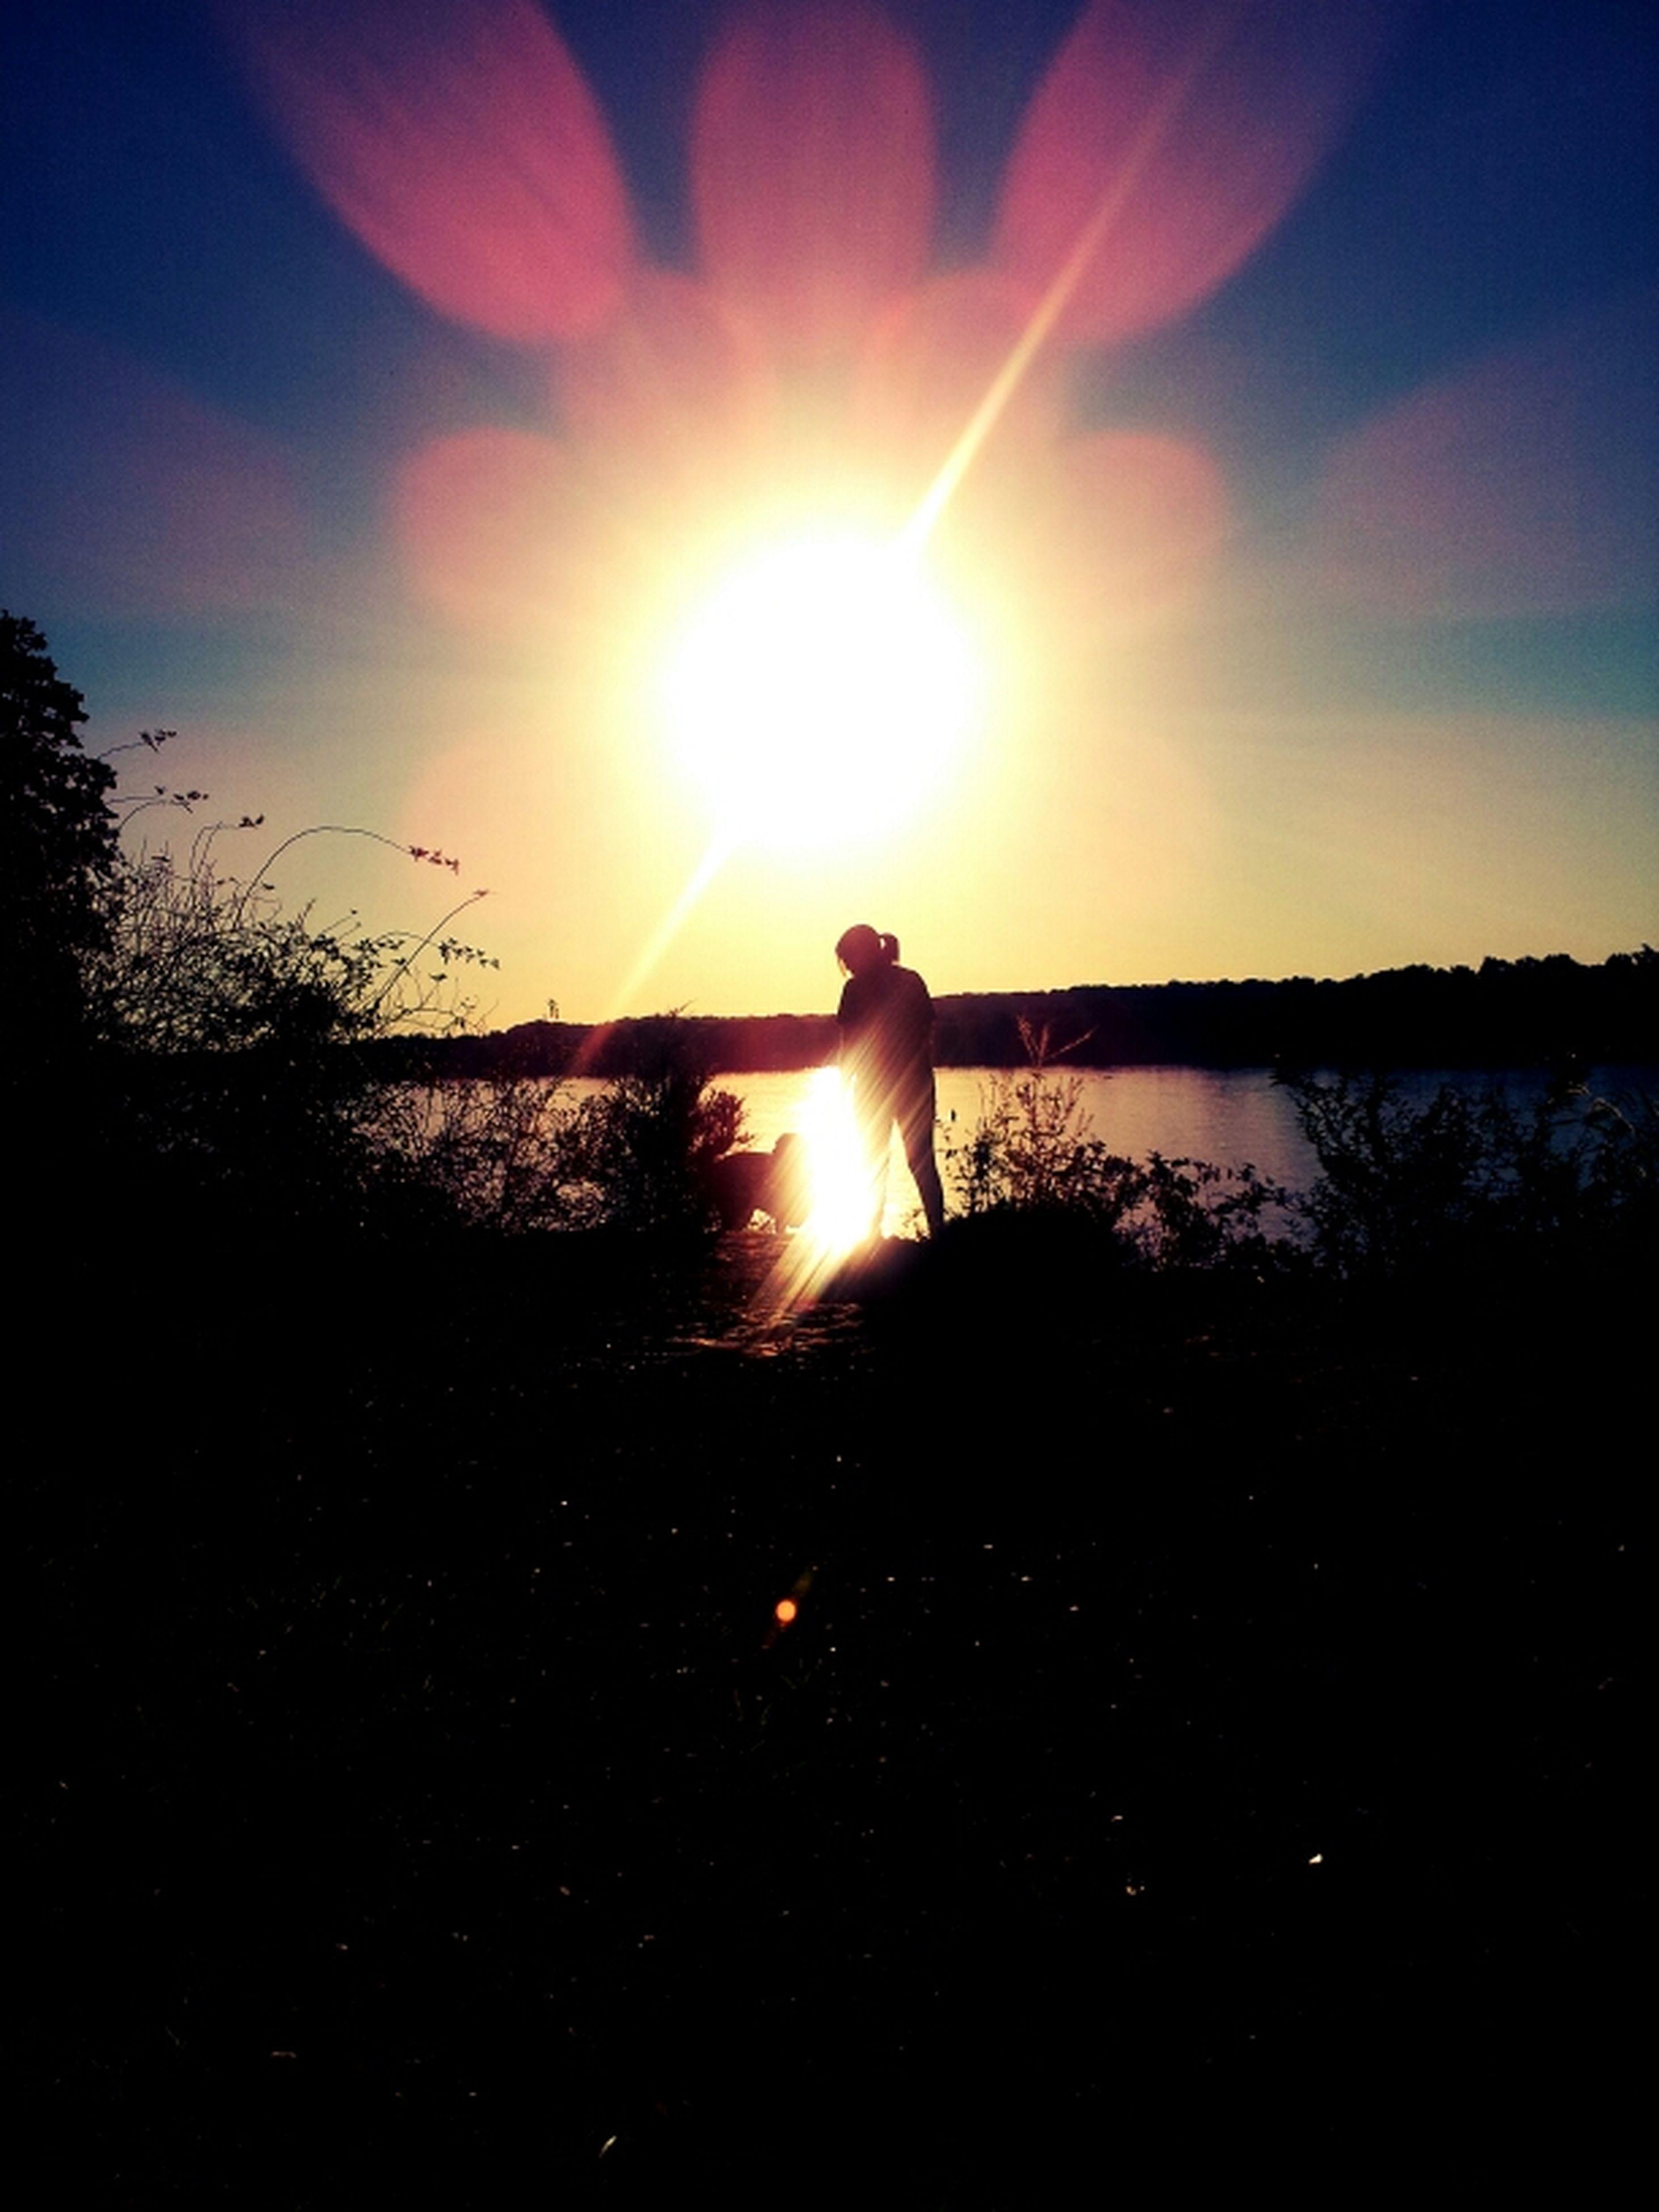 sun, sunset, silhouette, tranquil scene, tranquility, scenics, water, beauty in nature, sunlight, sky, nature, reflection, lake, sunbeam, tree, idyllic, lens flare, river, non-urban scene, landscape